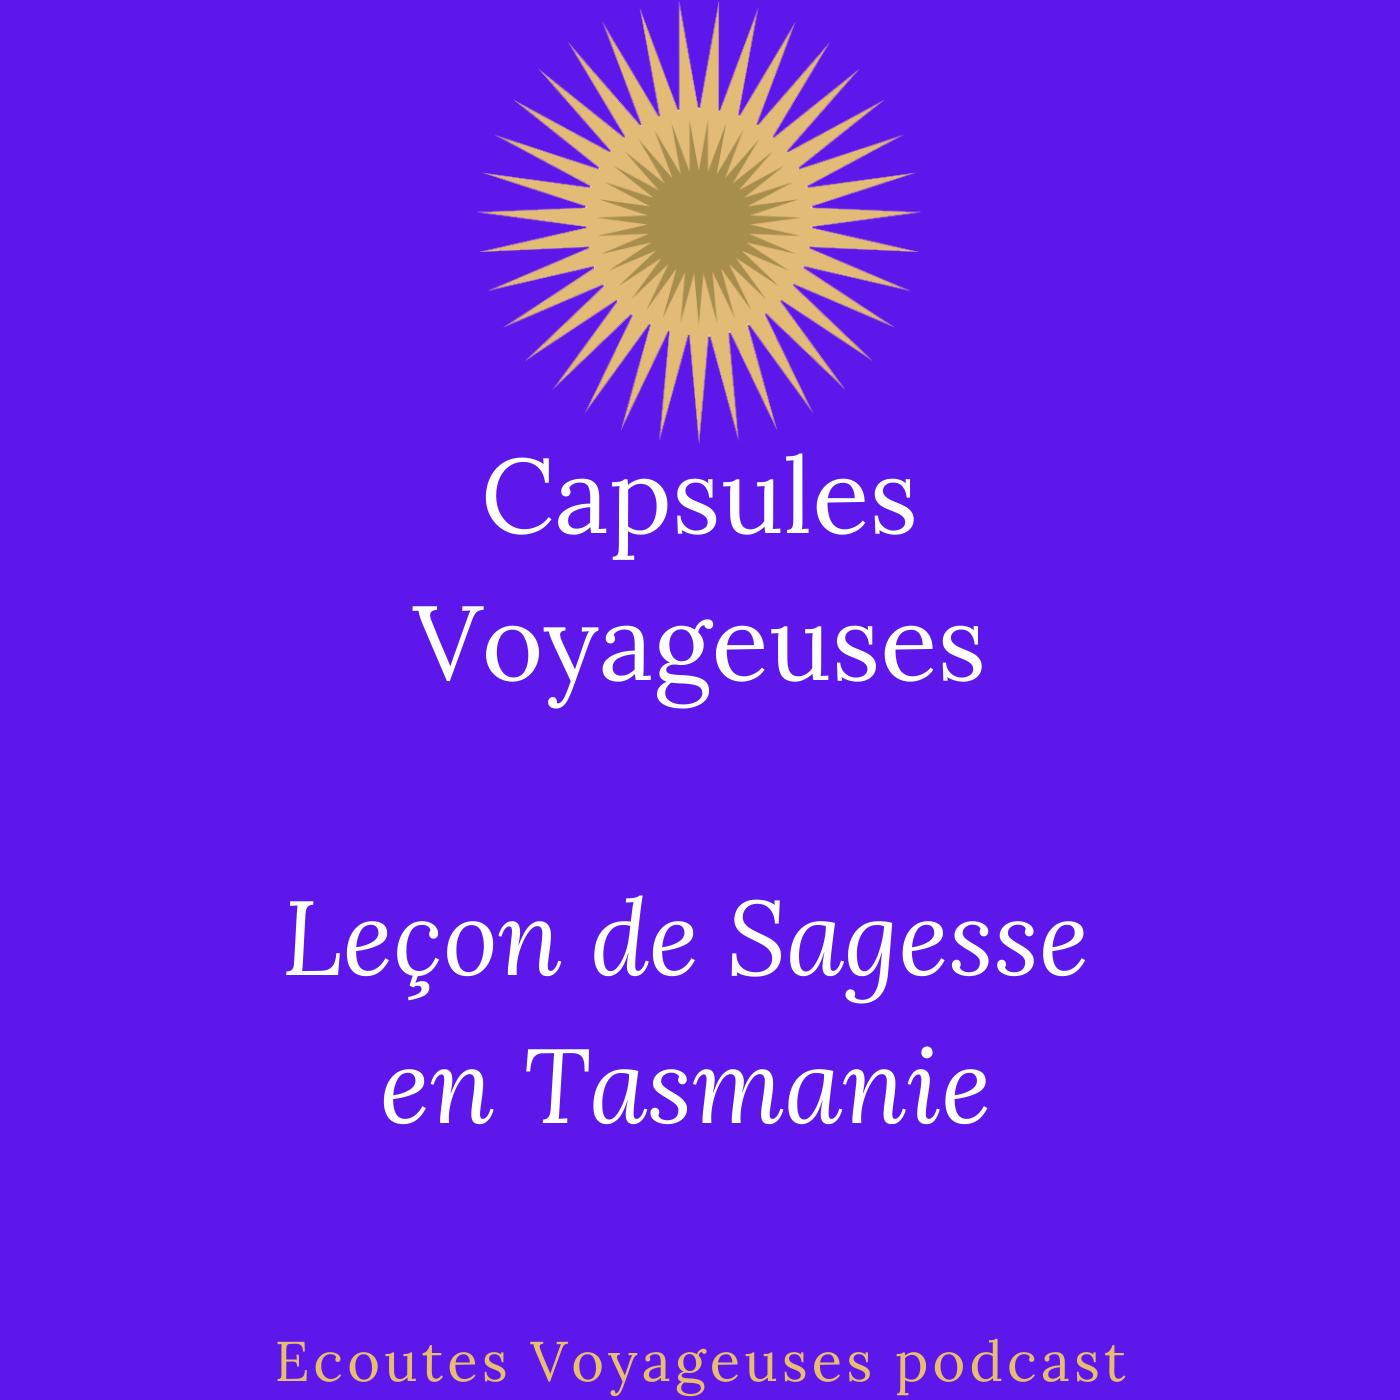 Leçon de Sagesse en Tasmanie / Capsules Voyageuses